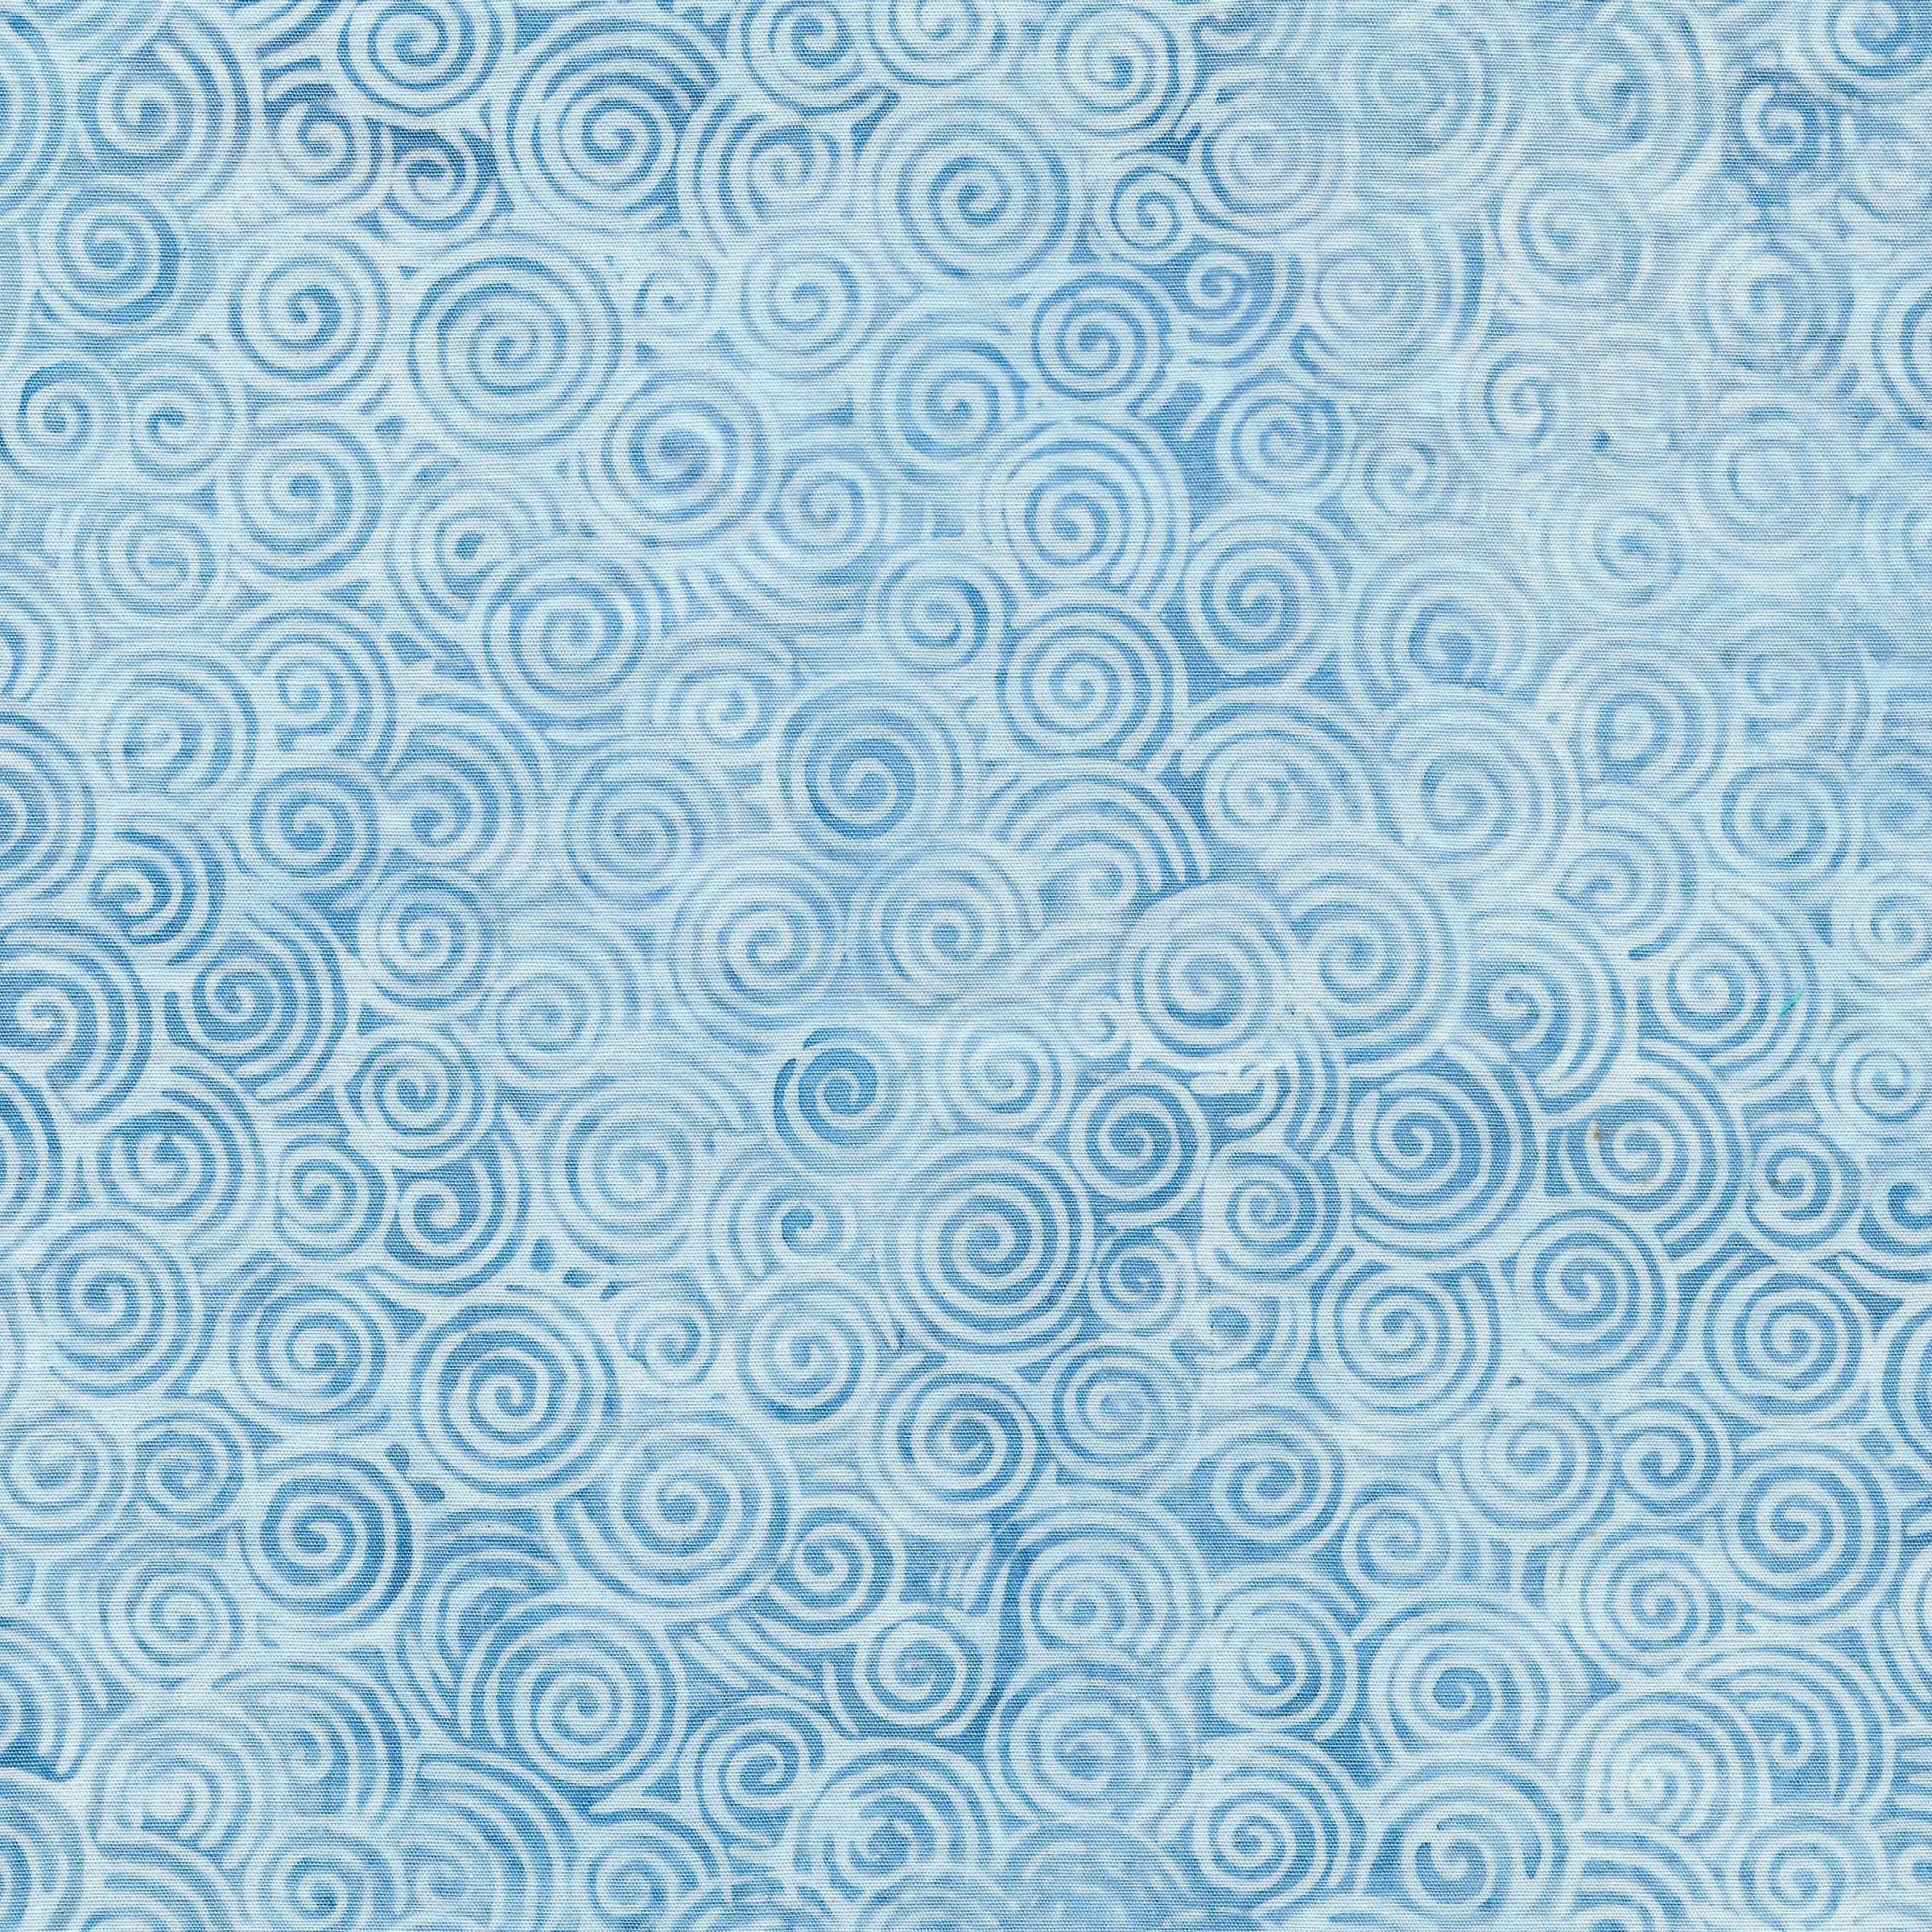 111908520 / Swirl-French Blue